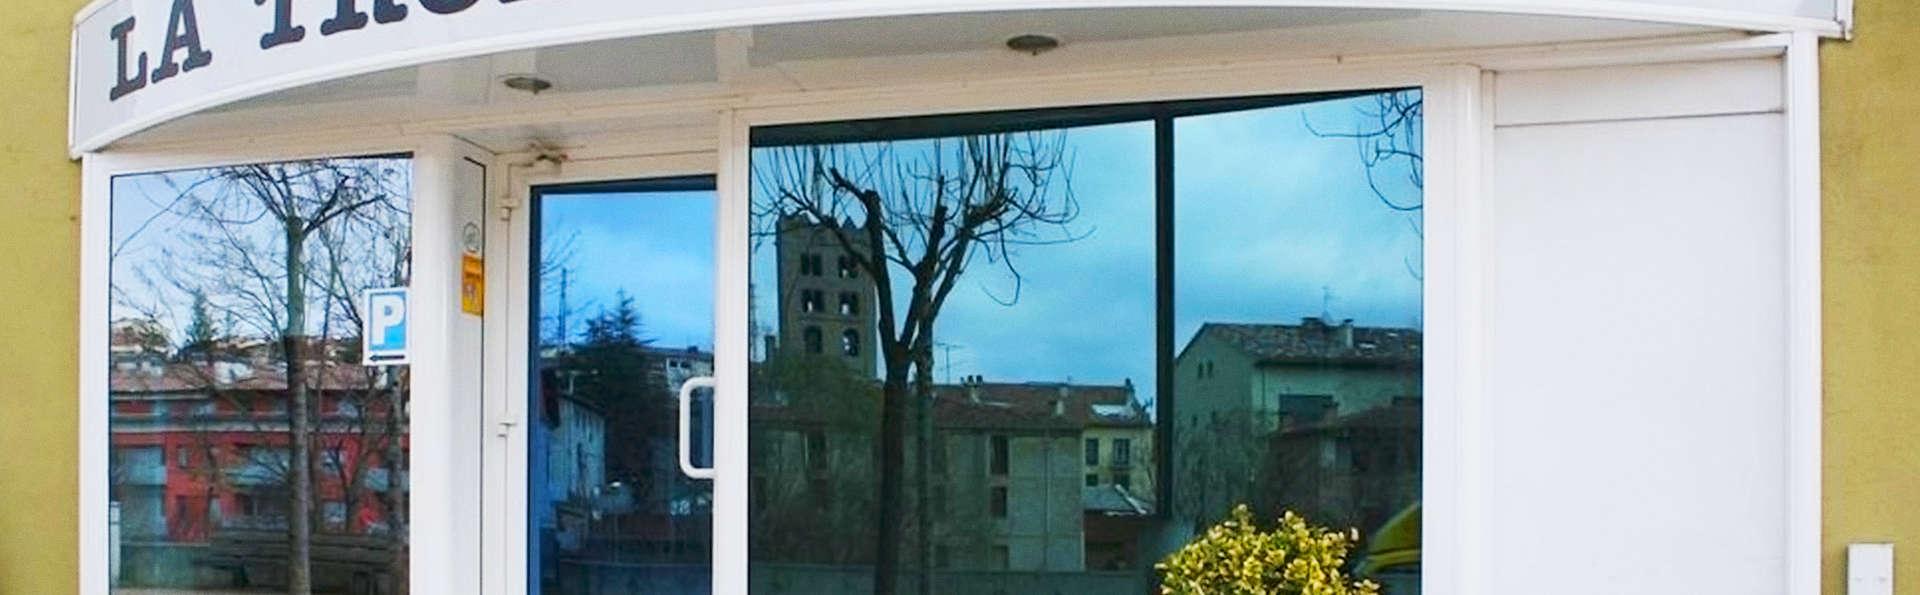 La Trobada Hotel - EDIT_1_FACHADA.jpg